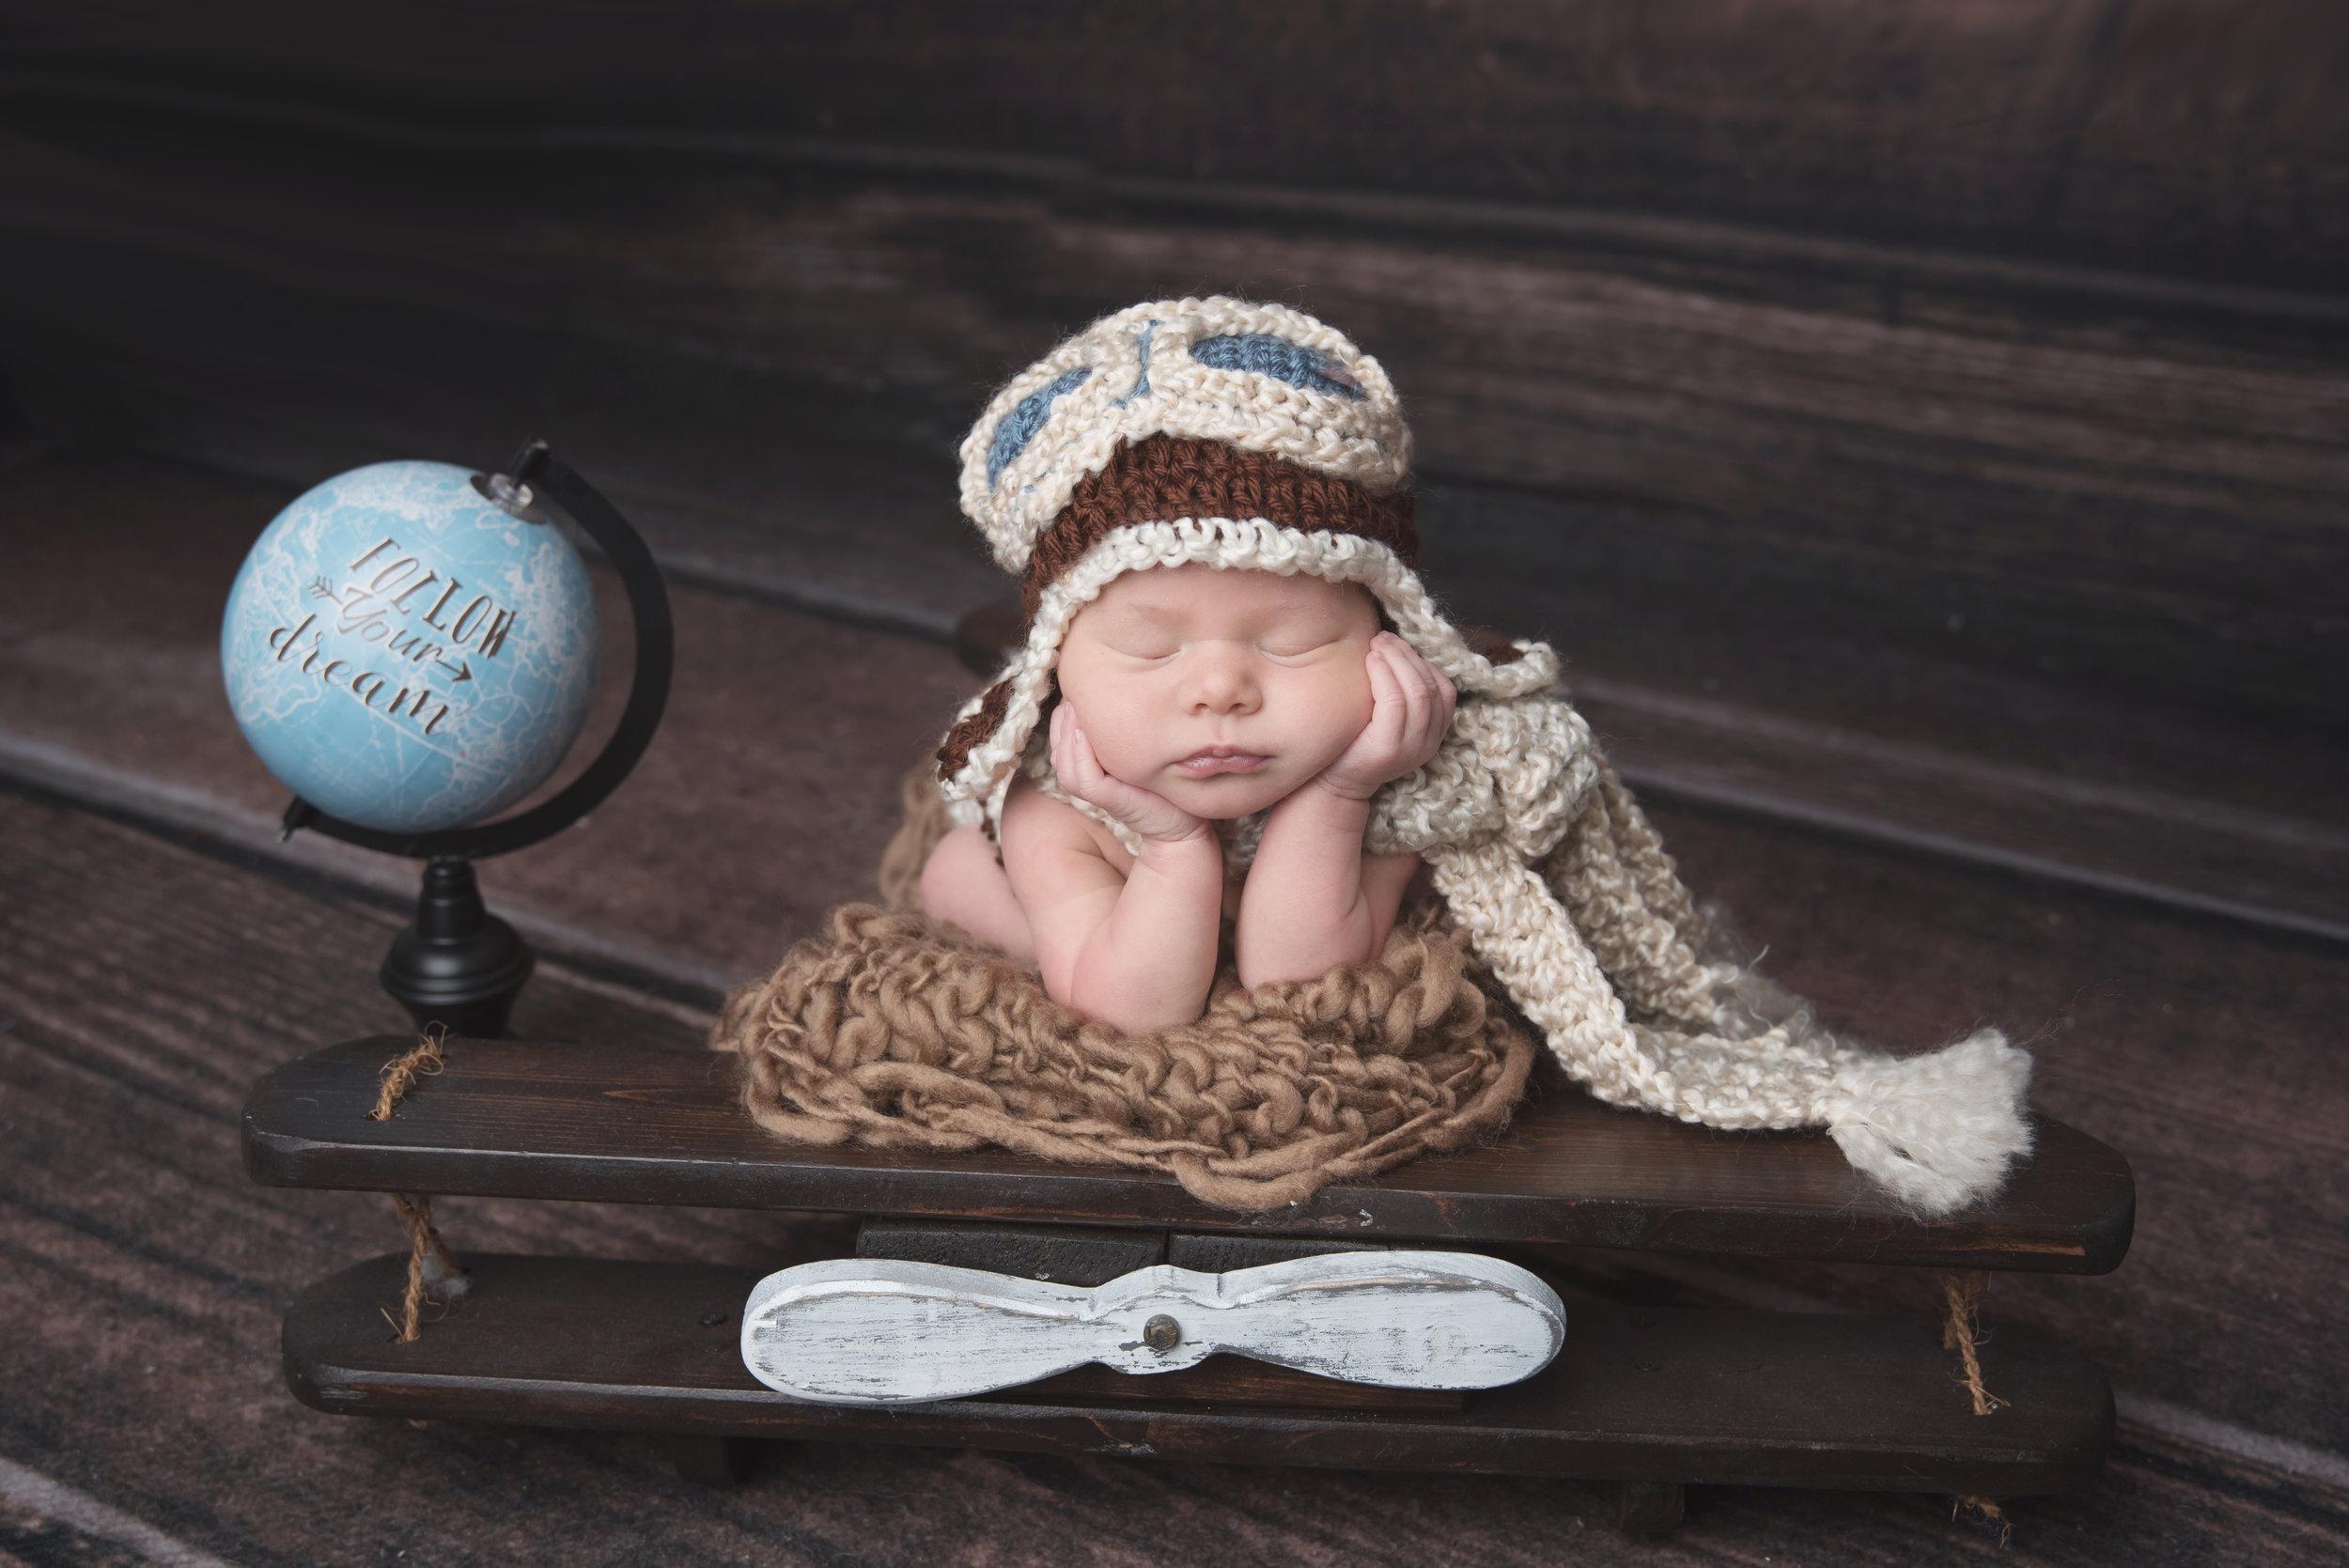 newborninaviatorhat.jpg